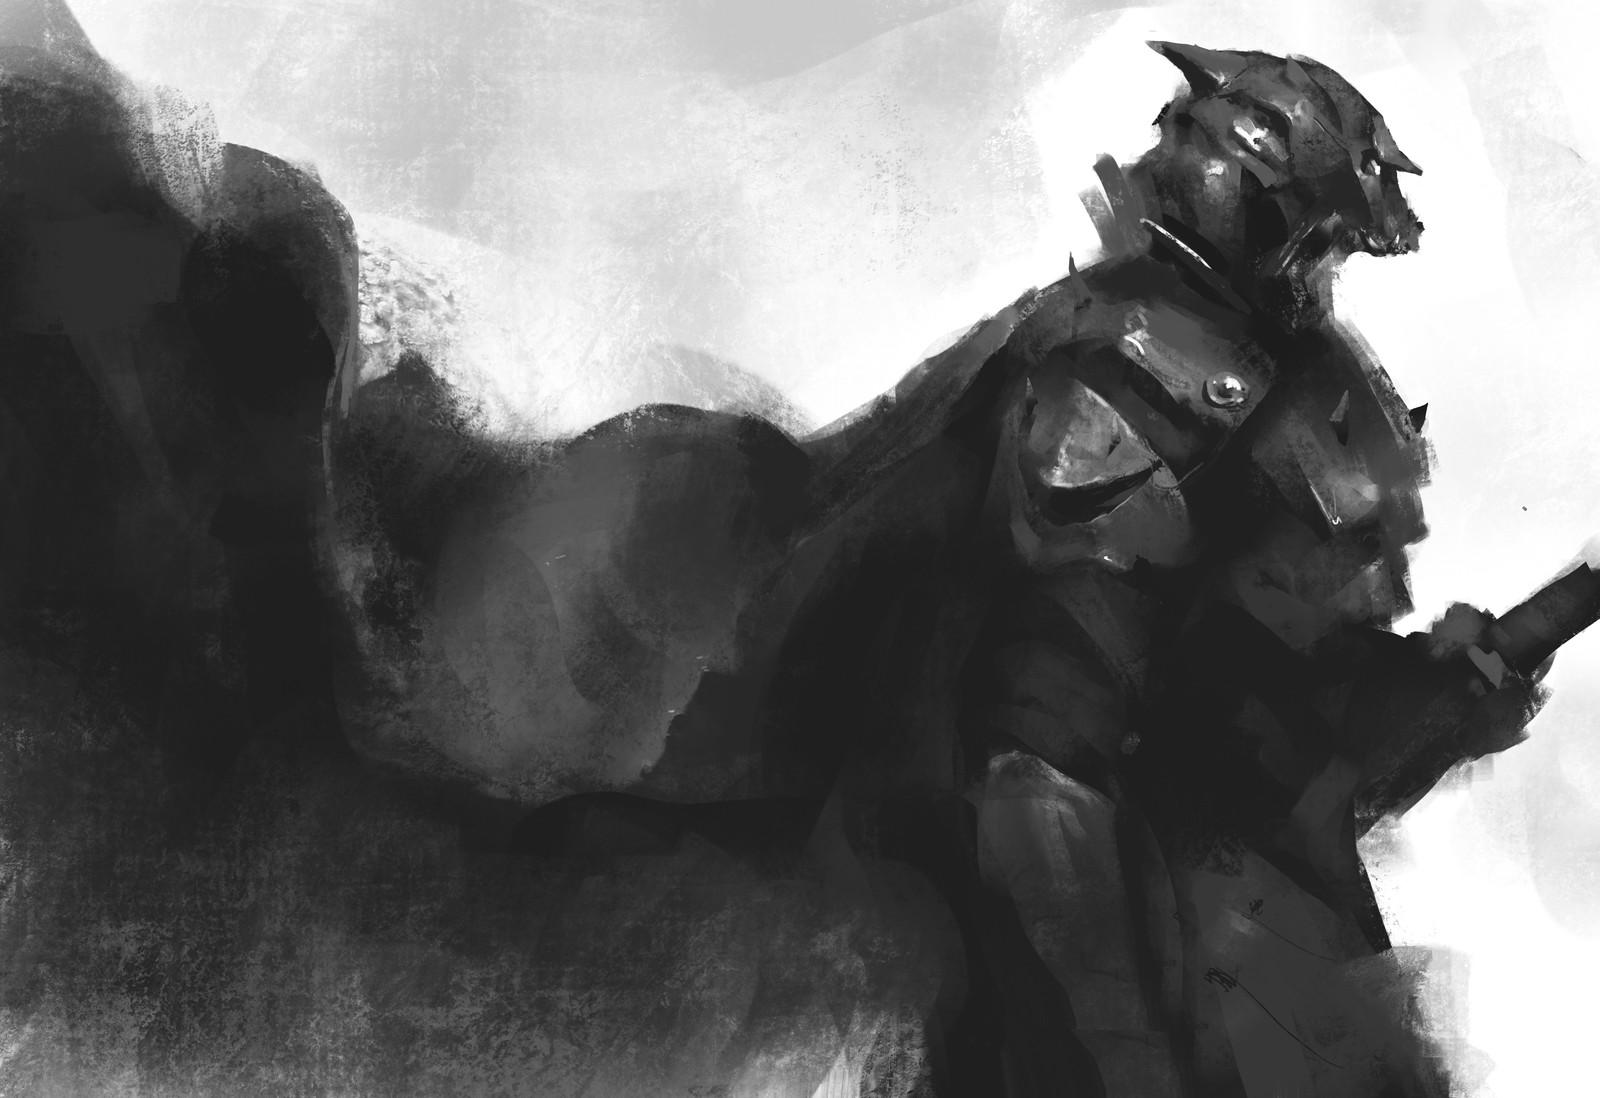 Anubis Knight